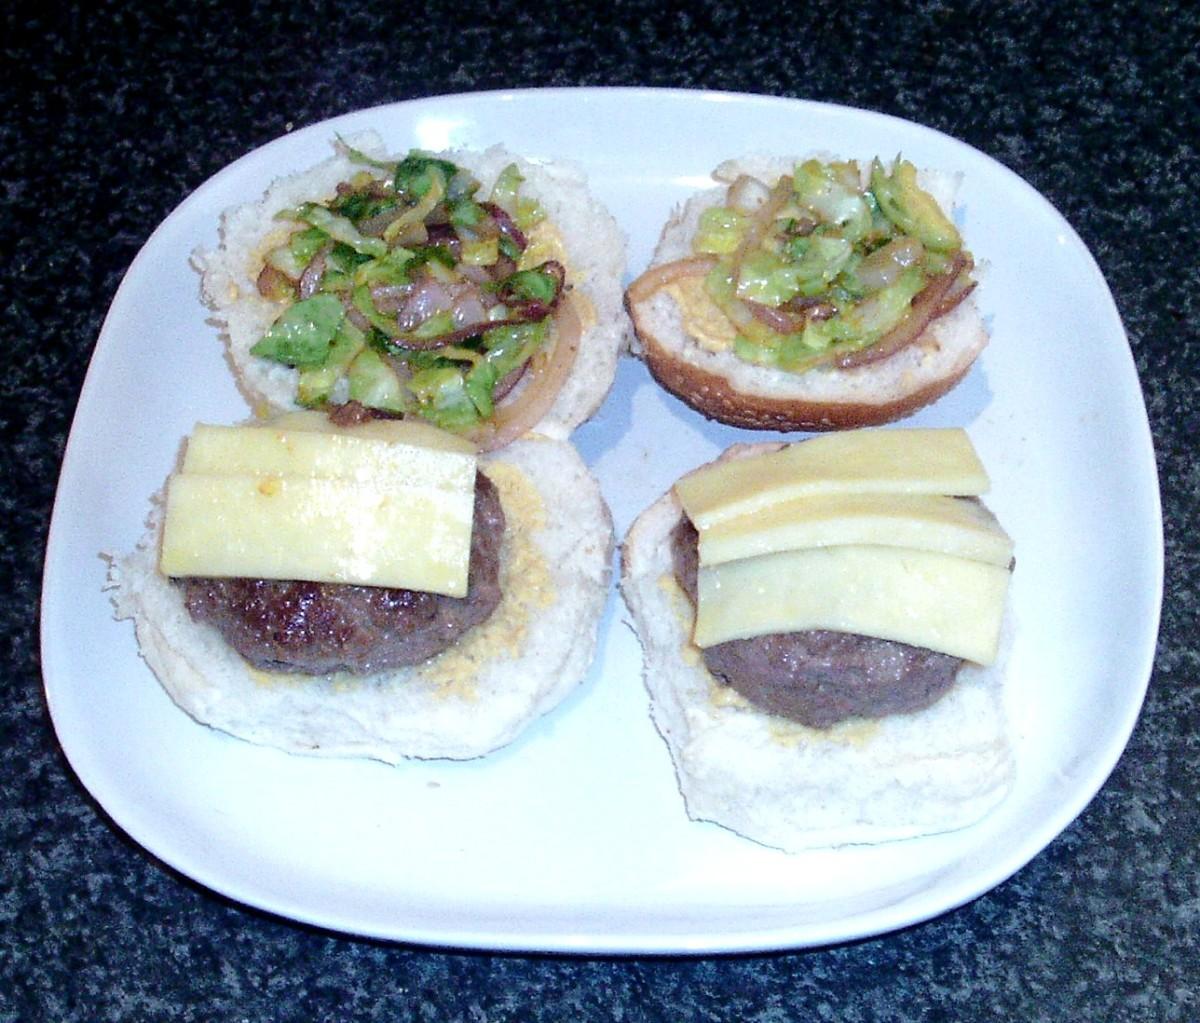 Assembled burgers